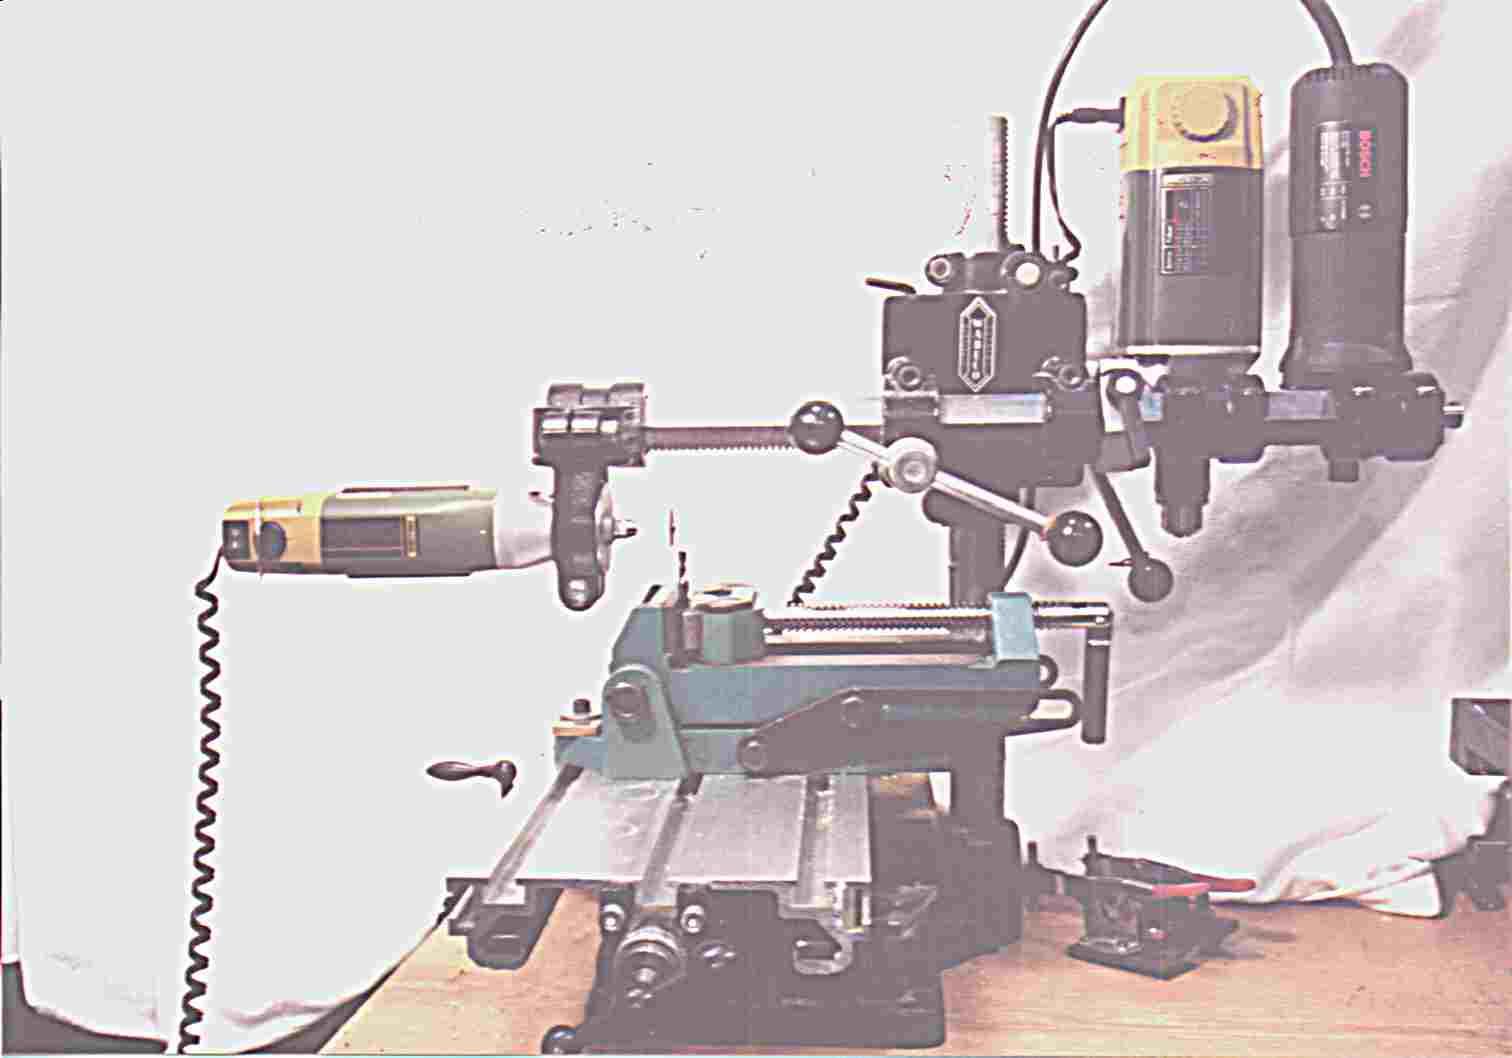 trickkiste drehmaschine selber bauen aus bohrer fr ser machen. Black Bedroom Furniture Sets. Home Design Ideas